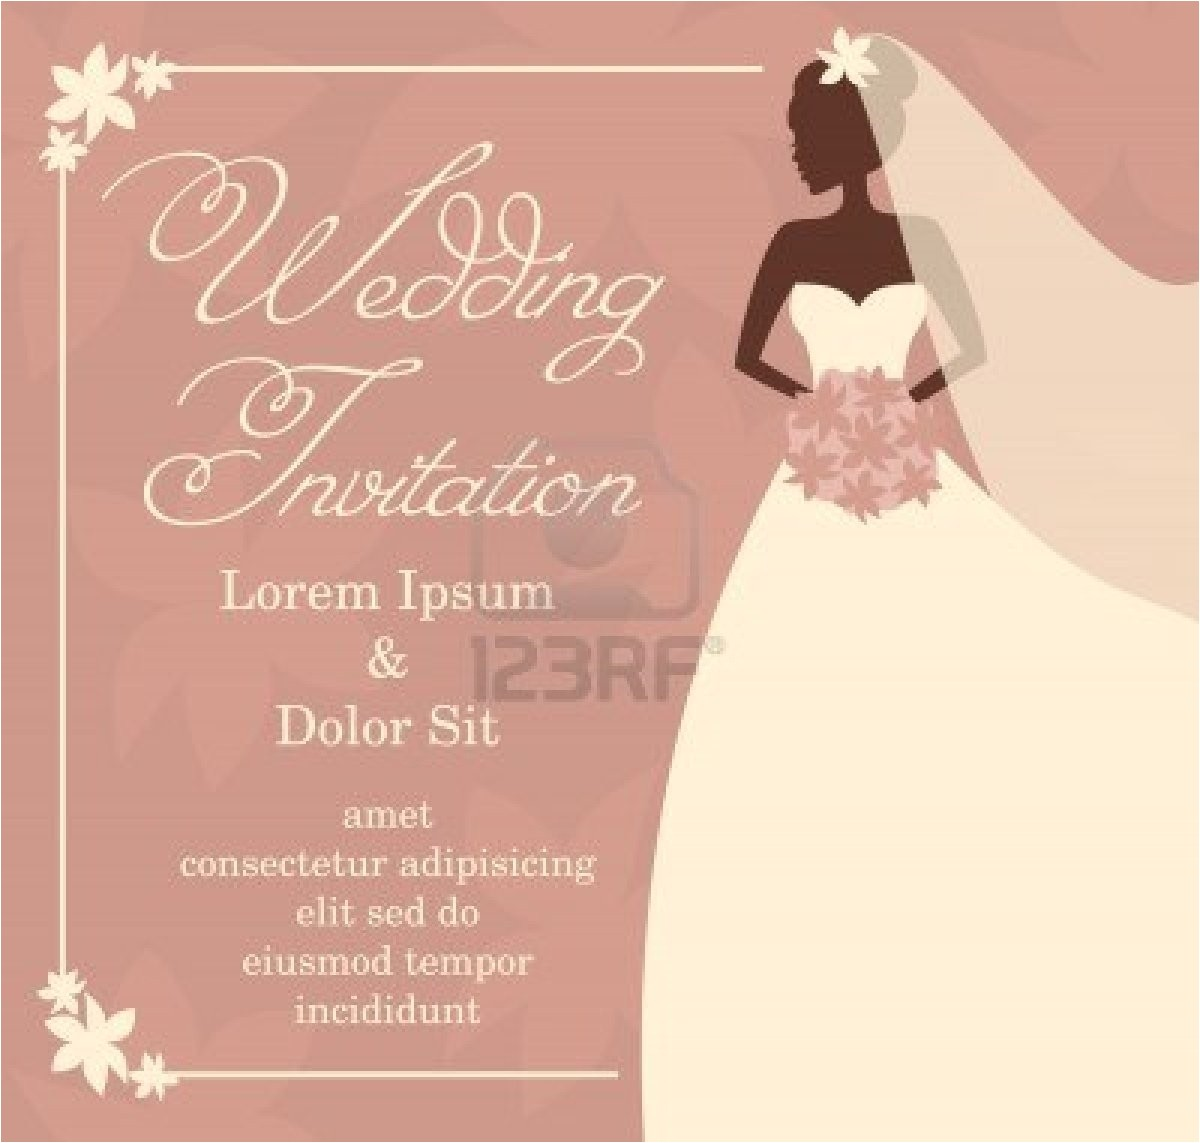 Free Online Bridal Shower Invitations Design Invitations Online Free Template Resume Builder